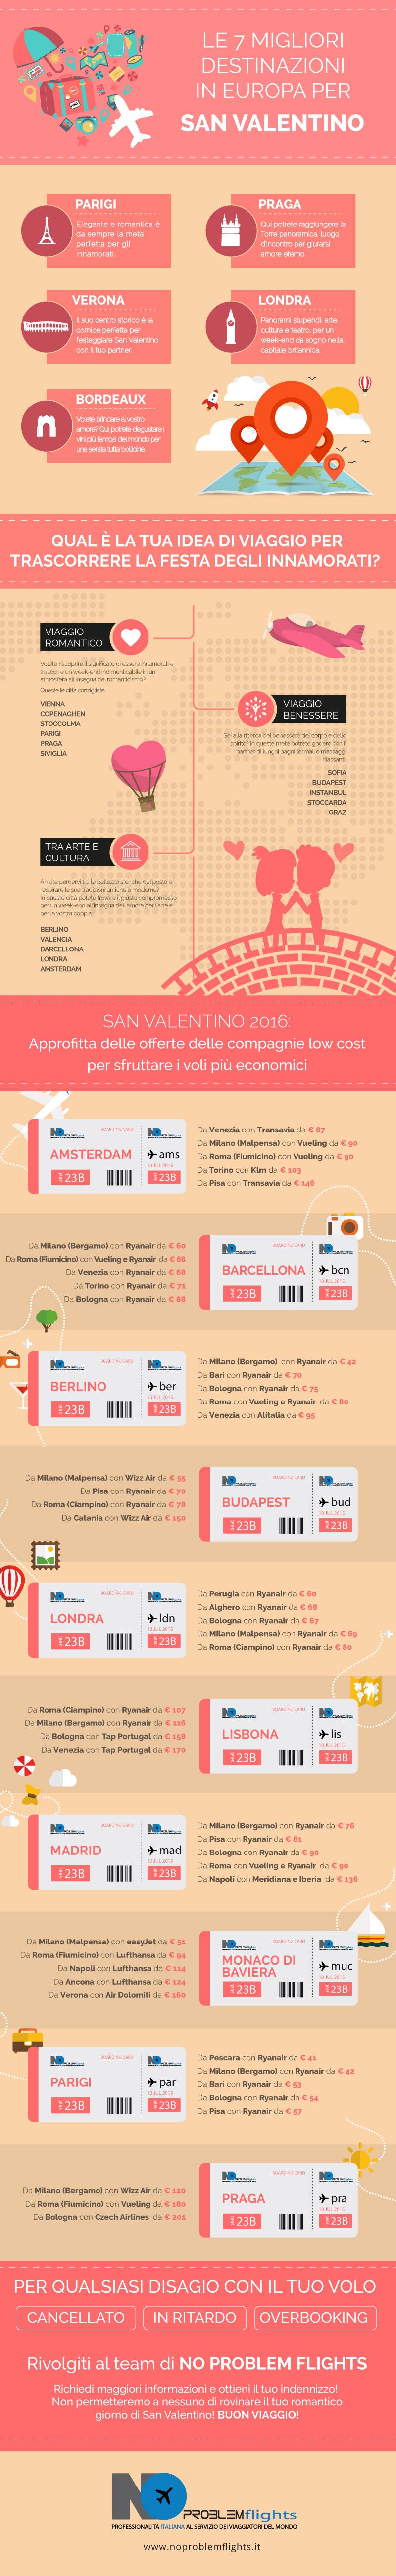 infografica idee san valentino